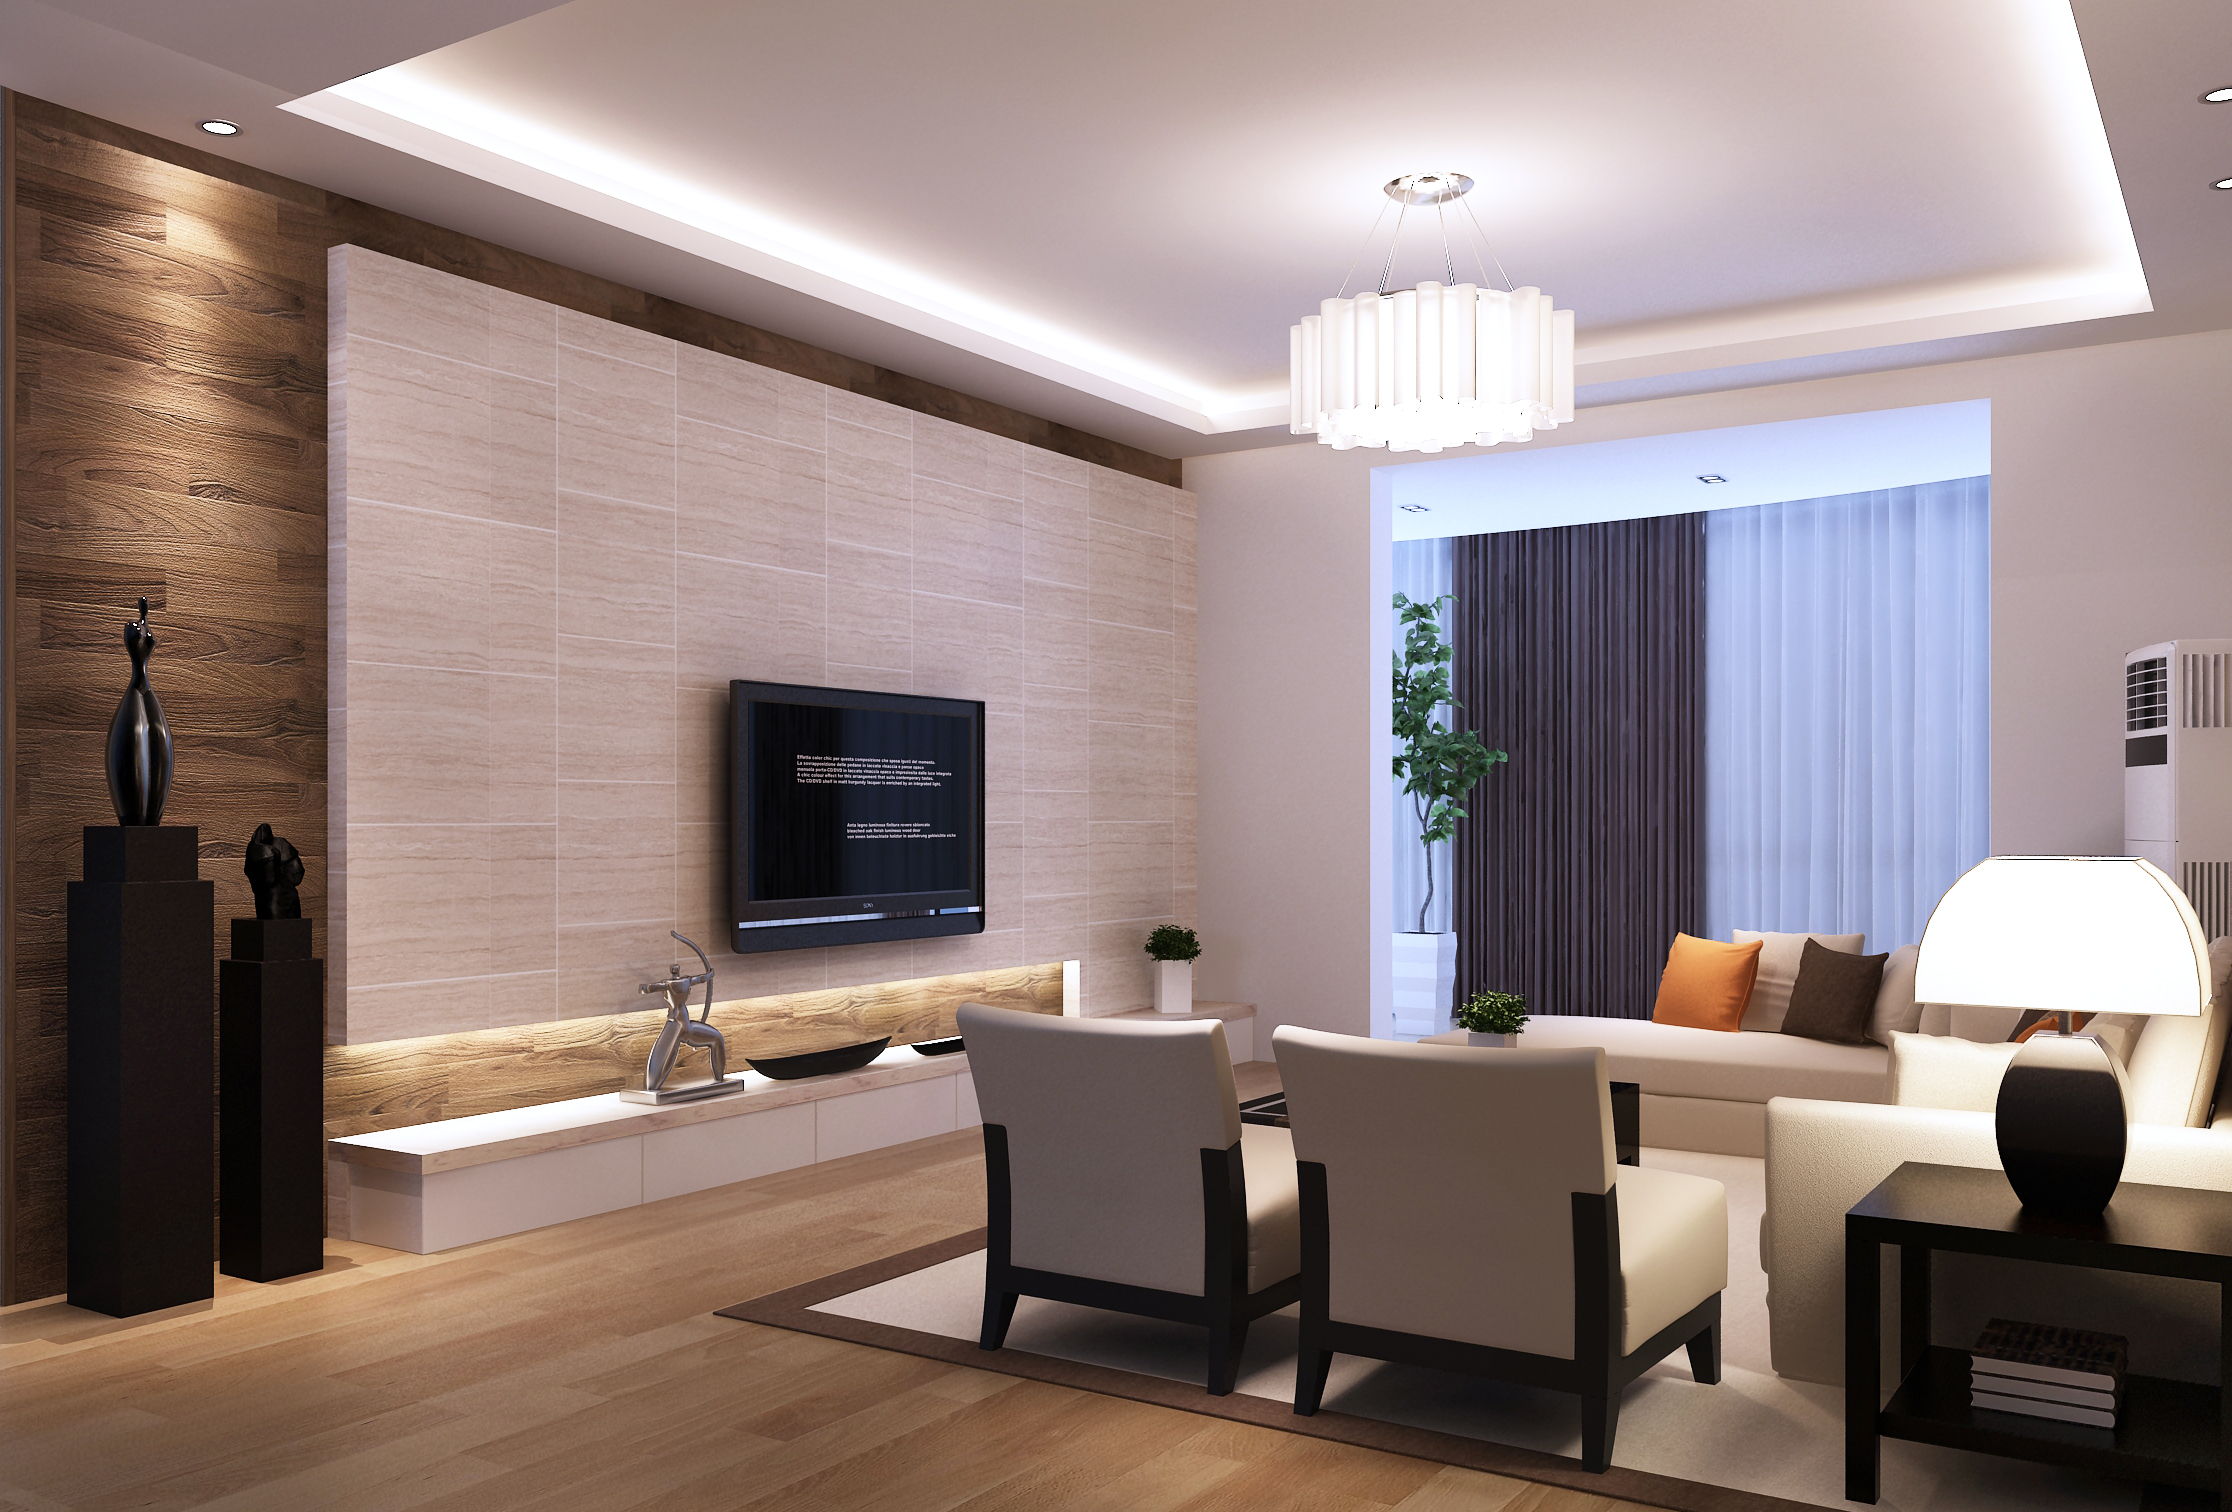 Living Room 3d Model 3d model modern living room architectural | cgtrader